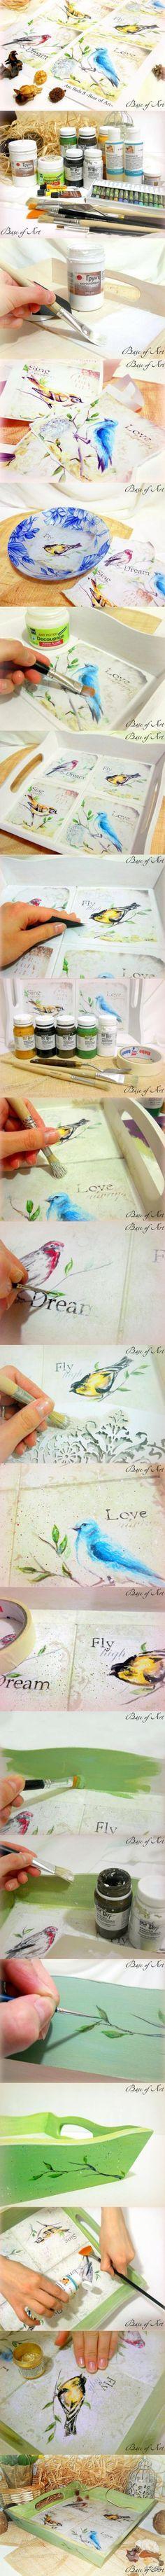 "Декупаж - Сайт любителей декупажа - DCPG.RU | Поднос ""Dream & Fly"". Мастер-класс от ""Base of Art"" Click on photo to see more! Нажмите на фото чтобы увидеть больше! decoupage art craft handmade home decor DIY do it yourself tutorial Materials and techniques:acrylic paint decoupage card craquelure wax varnish etc."